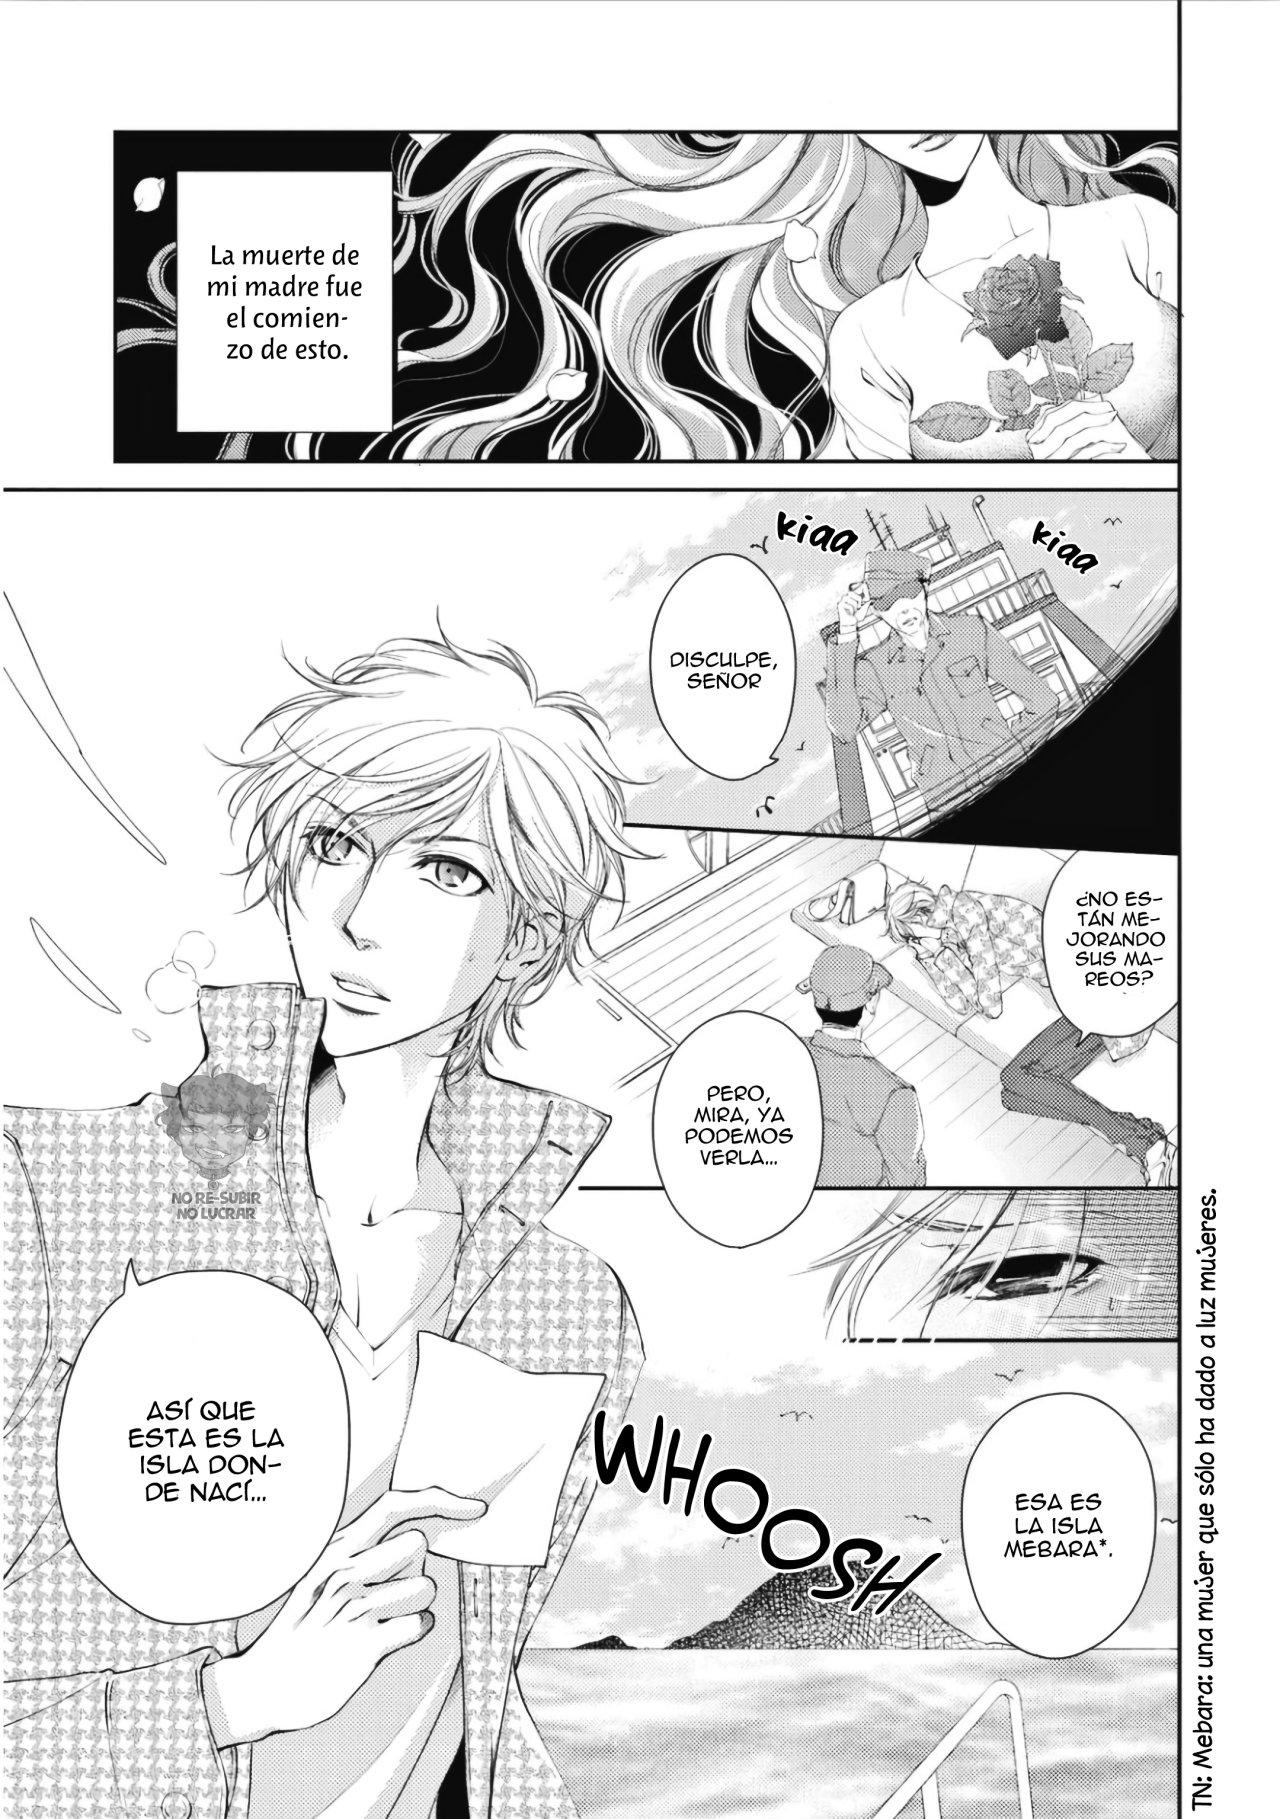 https://nine.mangadogs.com/es_manga/pic8/51/36659/946321/8ebd80808686b53556e62f8a9c0a73f2.jpg Page 9